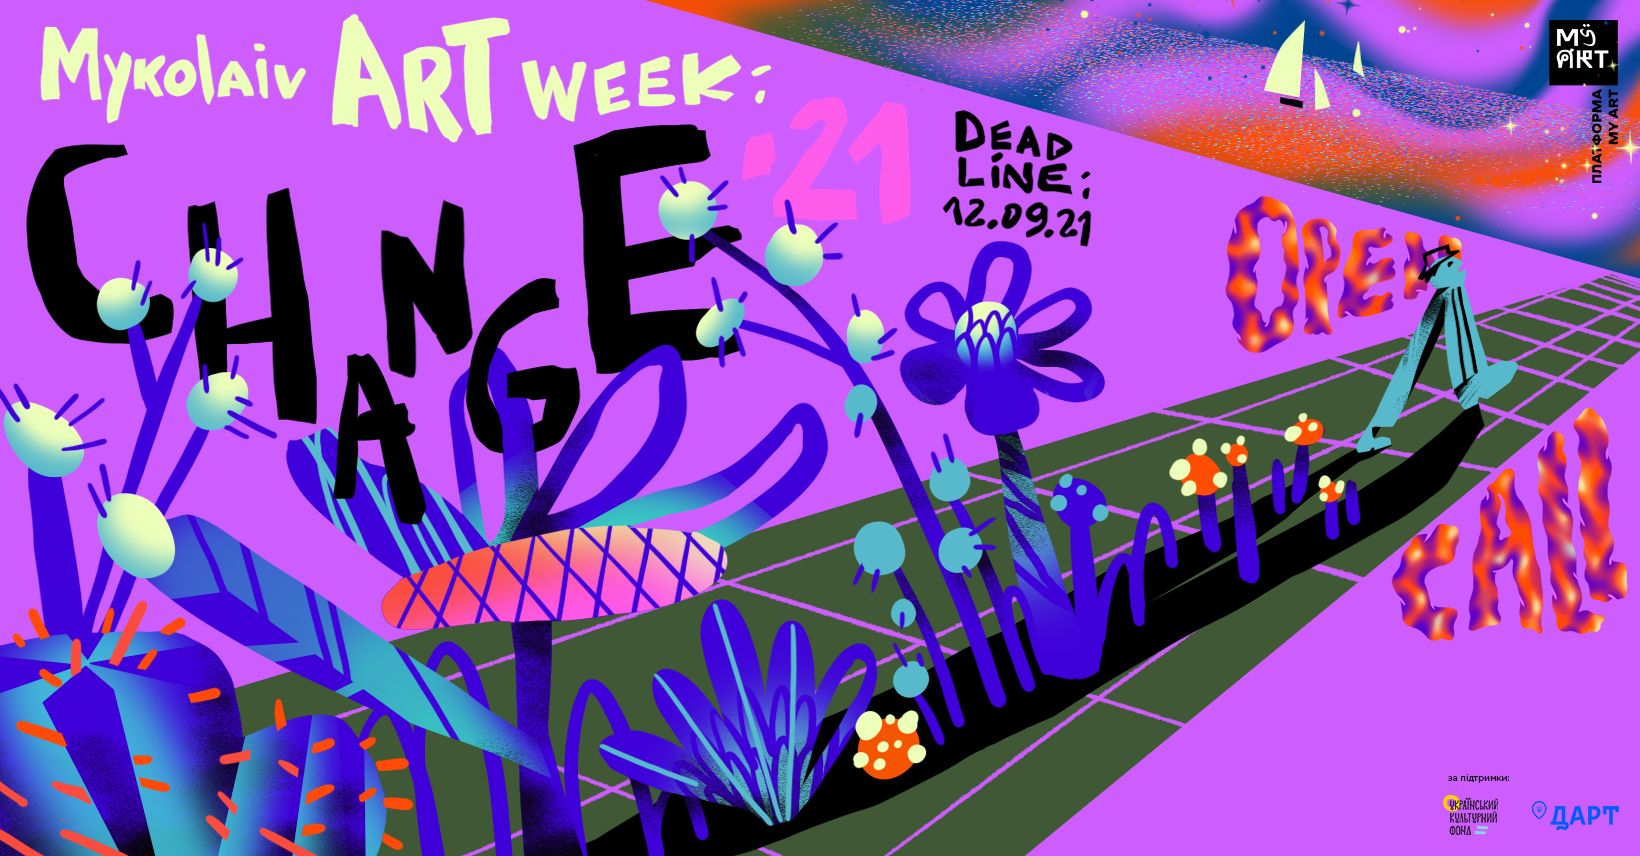 Mykolaiv ART Week объявил творческий конкурс на участие в главной выставке проекта CHANGE в Николаеве